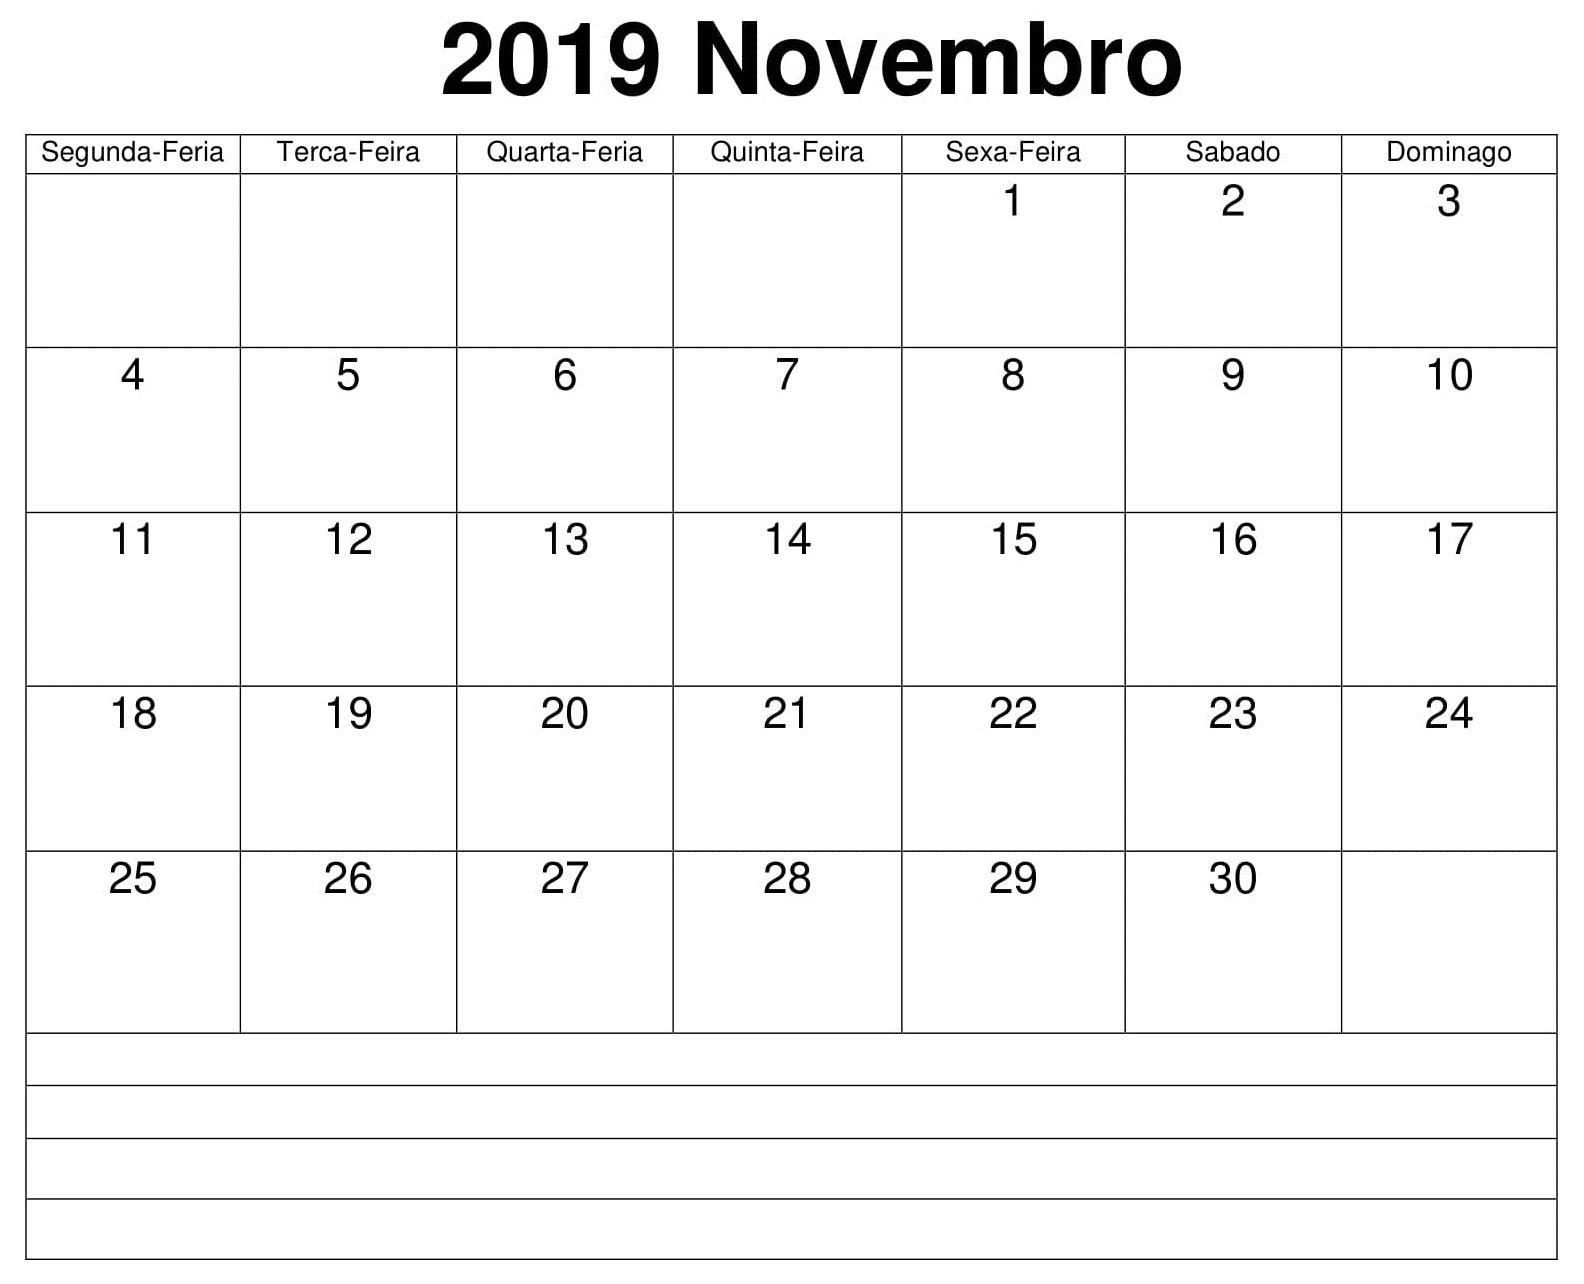 Calendario 2019 Para Imprimir En Chile Recientes Calendario 2019 Calendario 2019 Para Imprimir Of Calendario 2019 Para Imprimir En Chile Actual Calendario Marzo 2019 Modelo Best Reviews 2019 Newletterjdi